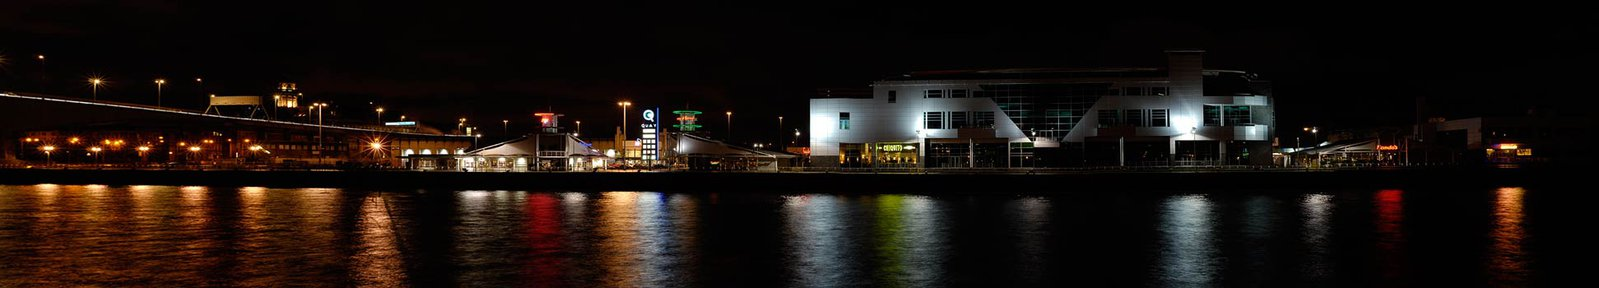 Night river pano 2